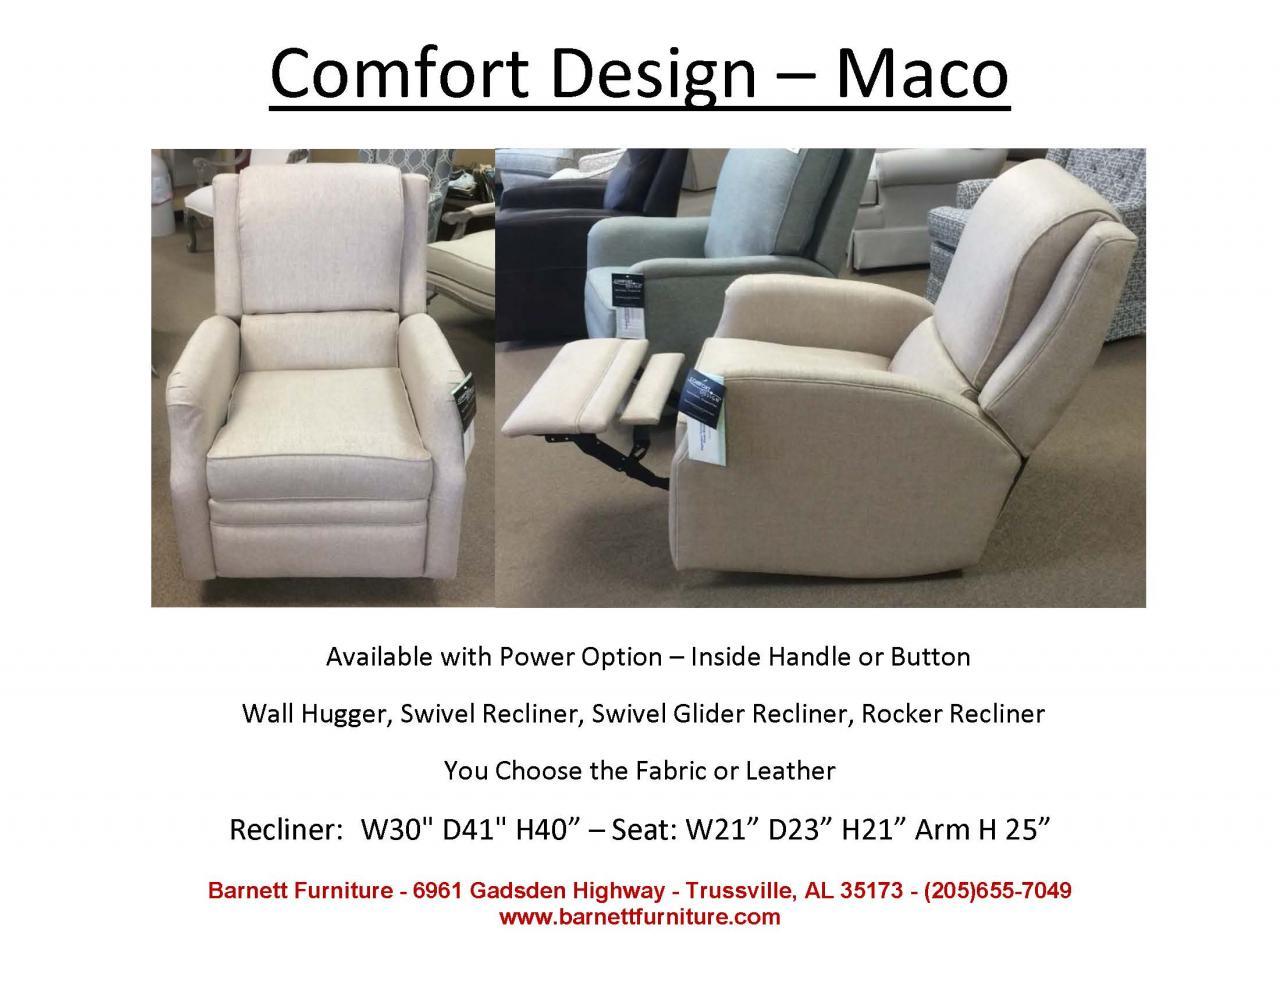 Comfort Design Maco Recliner